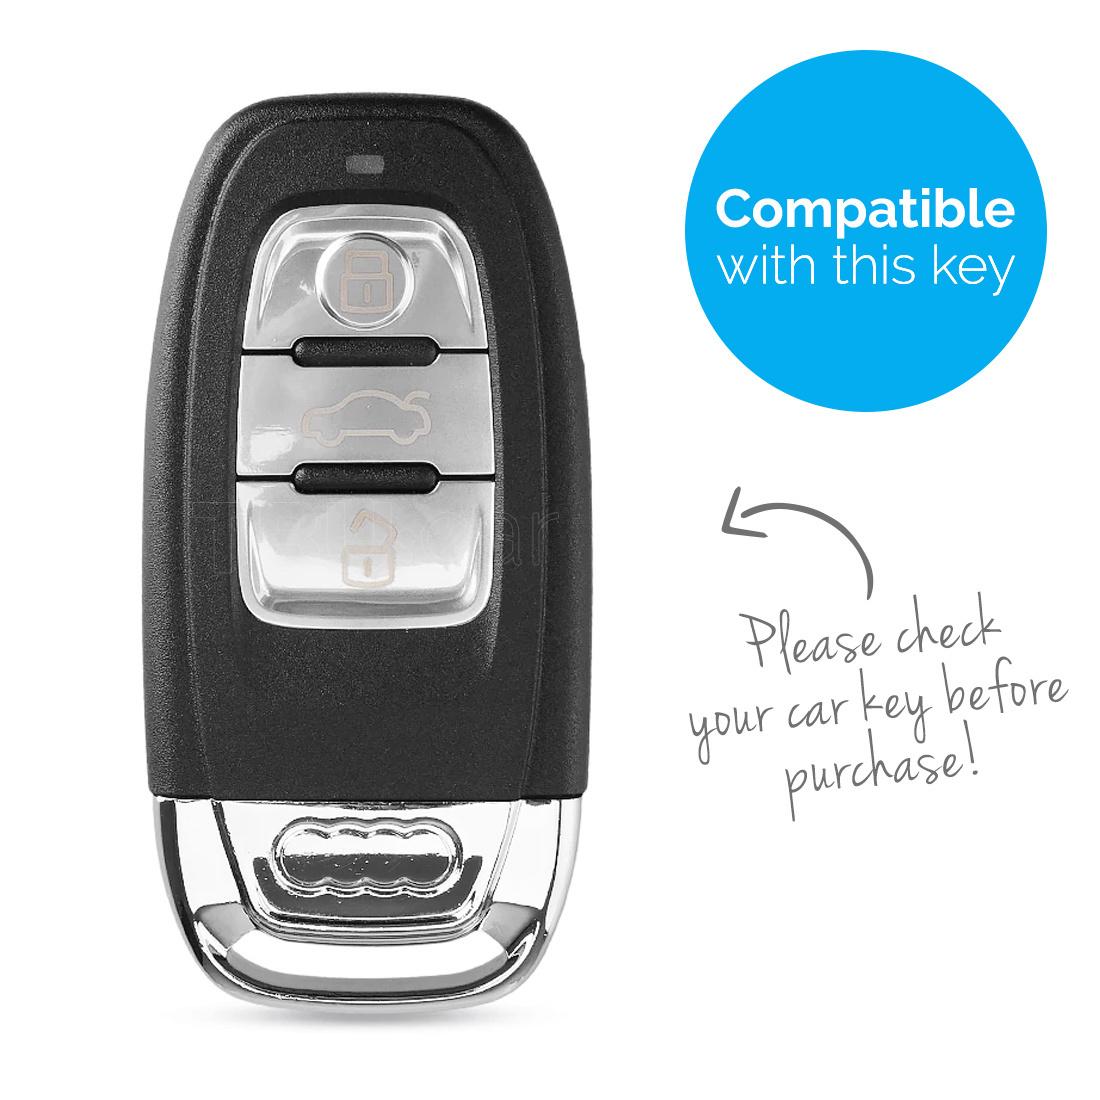 TBU car TBU car Autoschlüssel Hülle kompatibel mit Audi 3 Tasten (Keyless Entry) - Schutzhülle aus Silikon - Auto Schlüsselhülle Cover in Schwarz